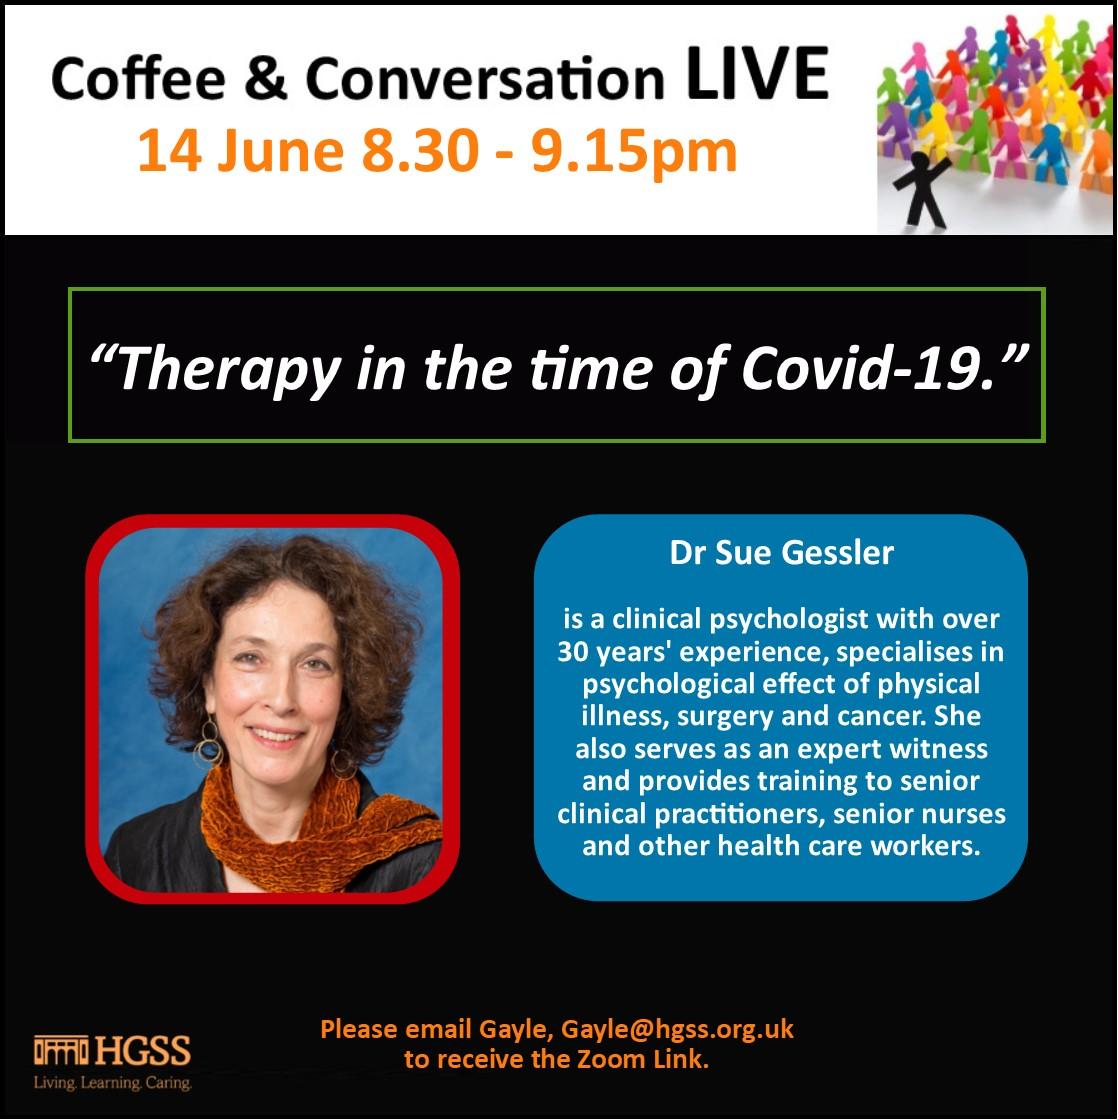 Coffee & Conversation LIVE @ HGSS